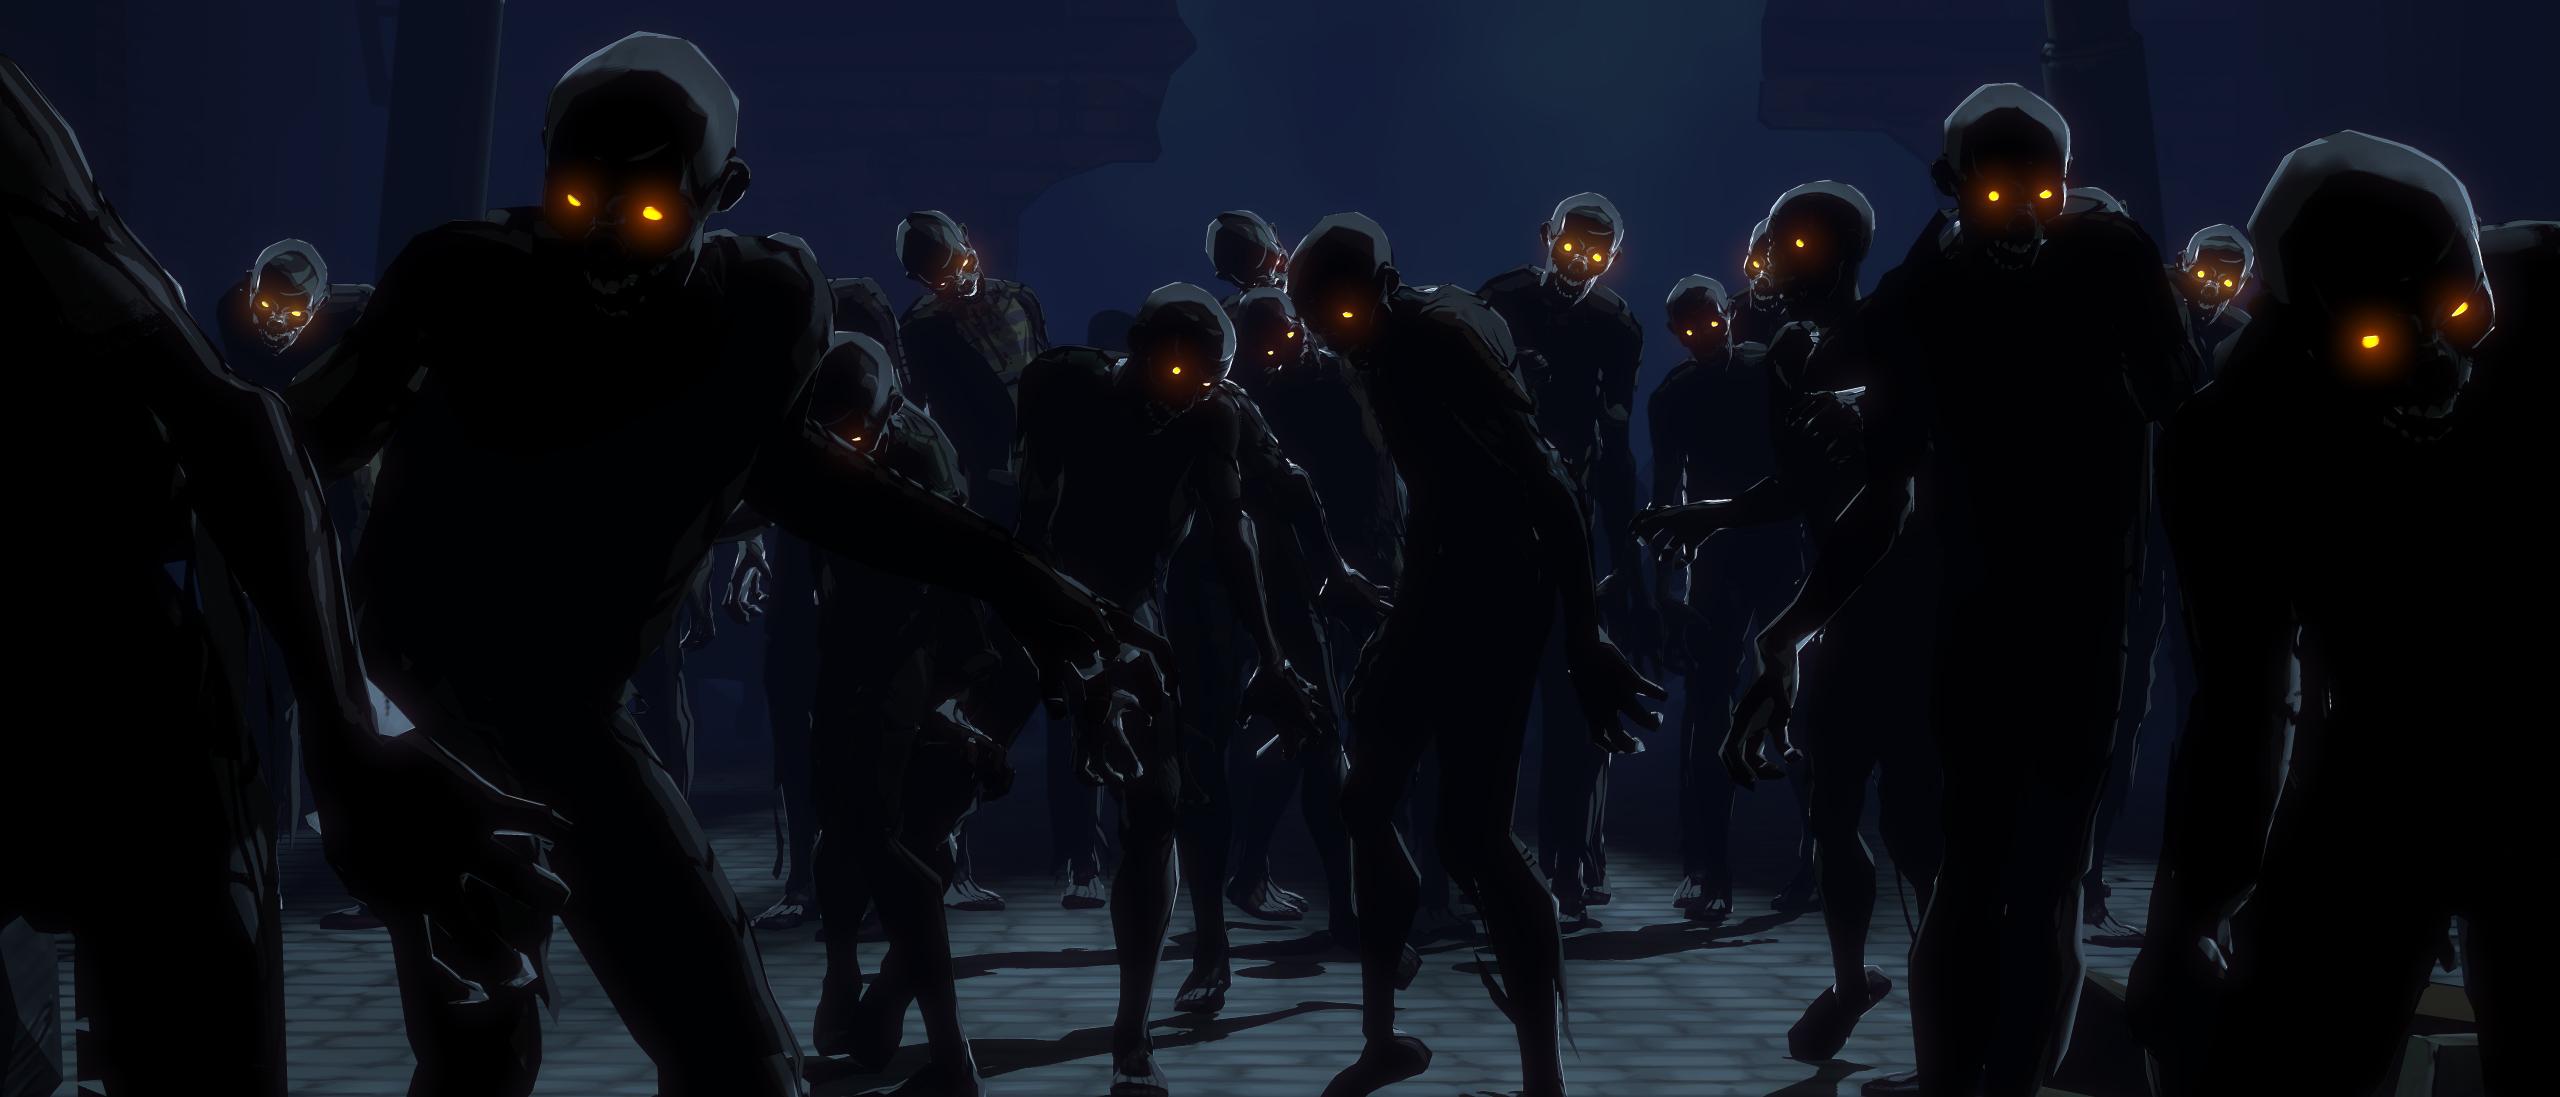 Sfondi : notte cielo cartone animato zombie mezzanotte yaiba